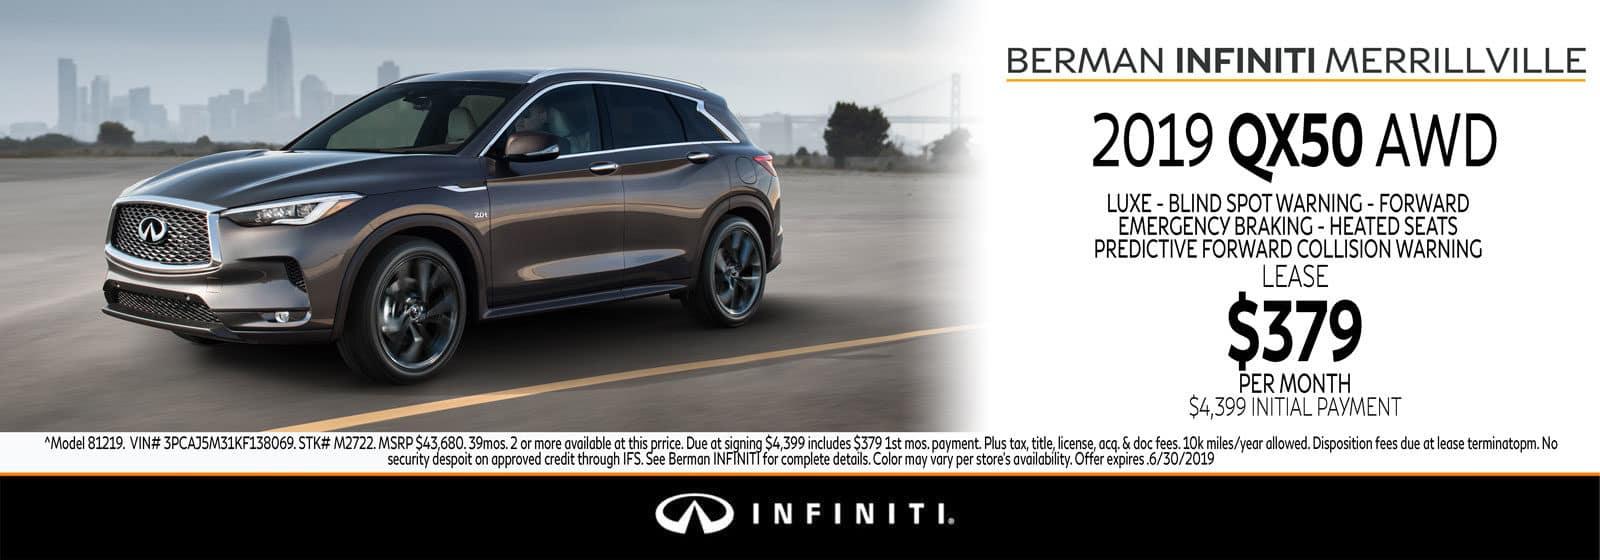 New 2019 INFINITI QX50 June Offer at Berman INFINITI of Merrillville!